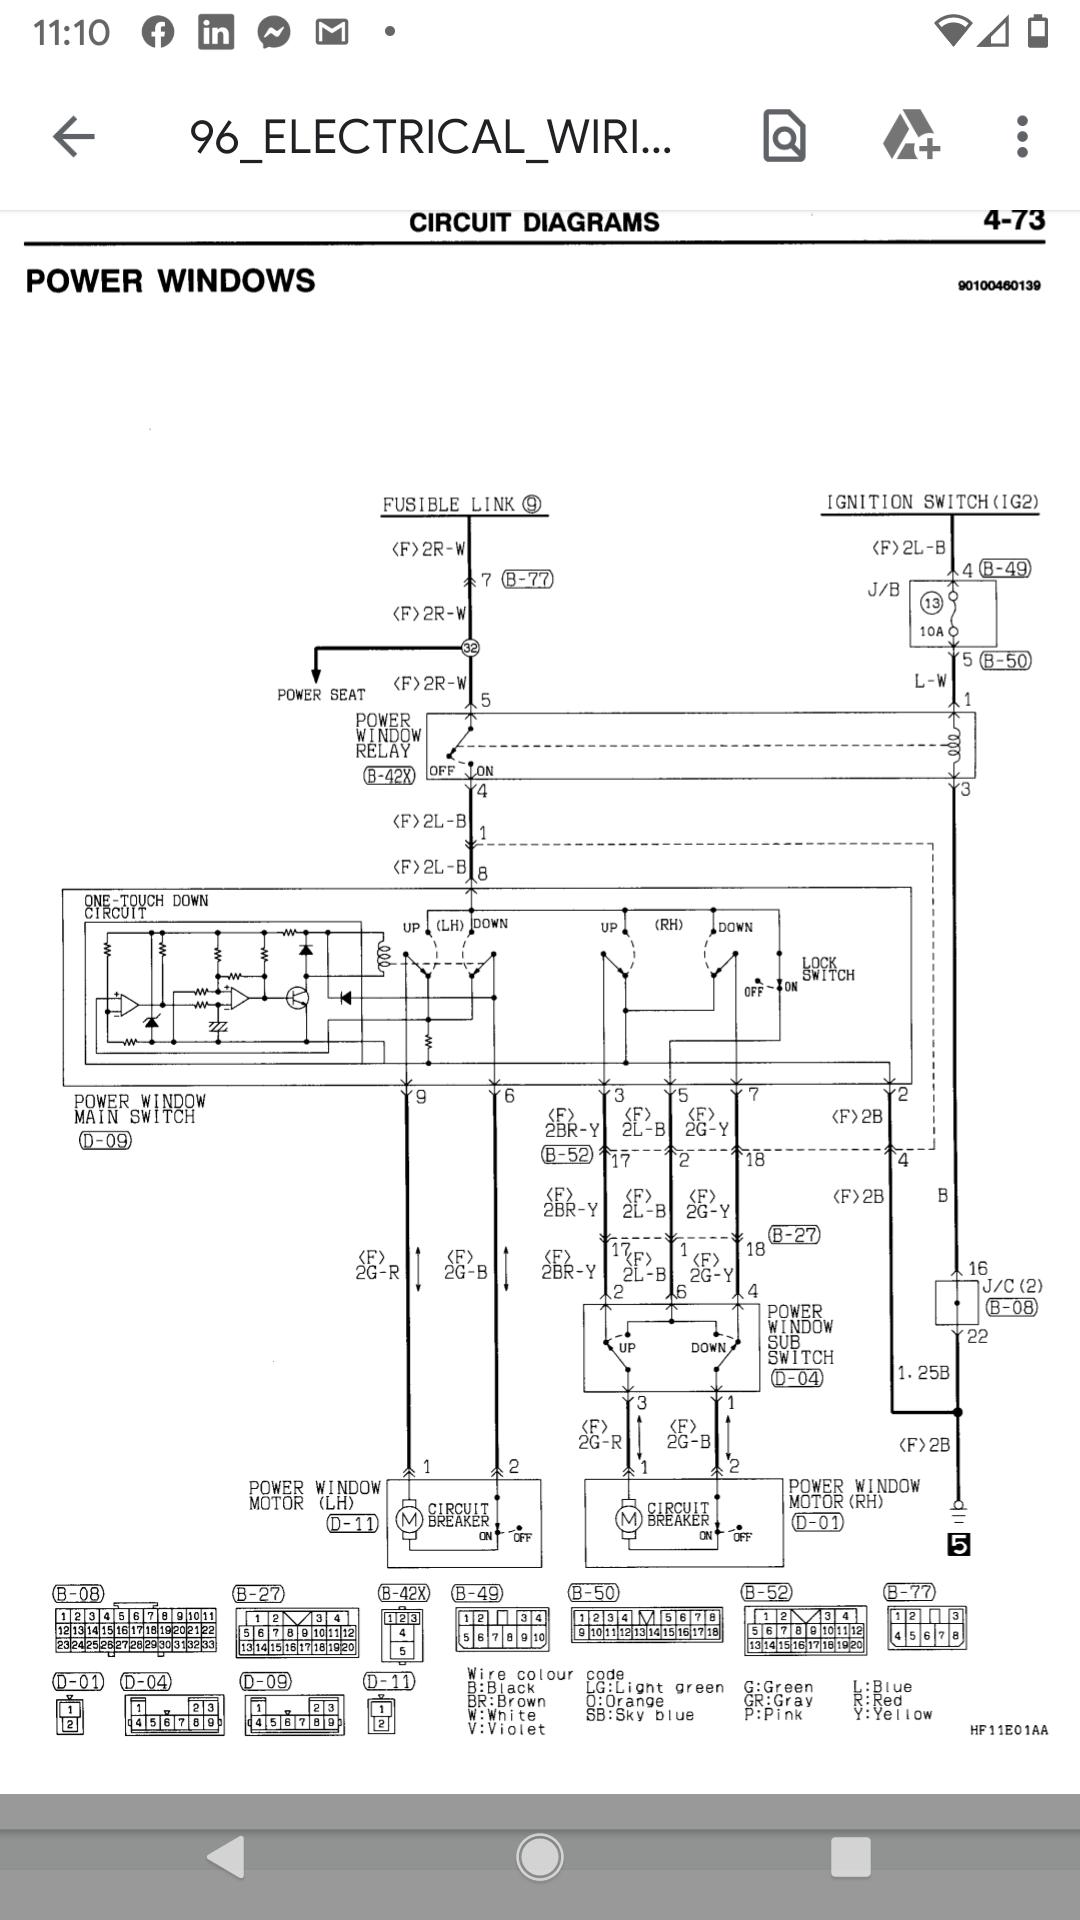 Window Switch Question Mitsubishi Eclipse 3g Club